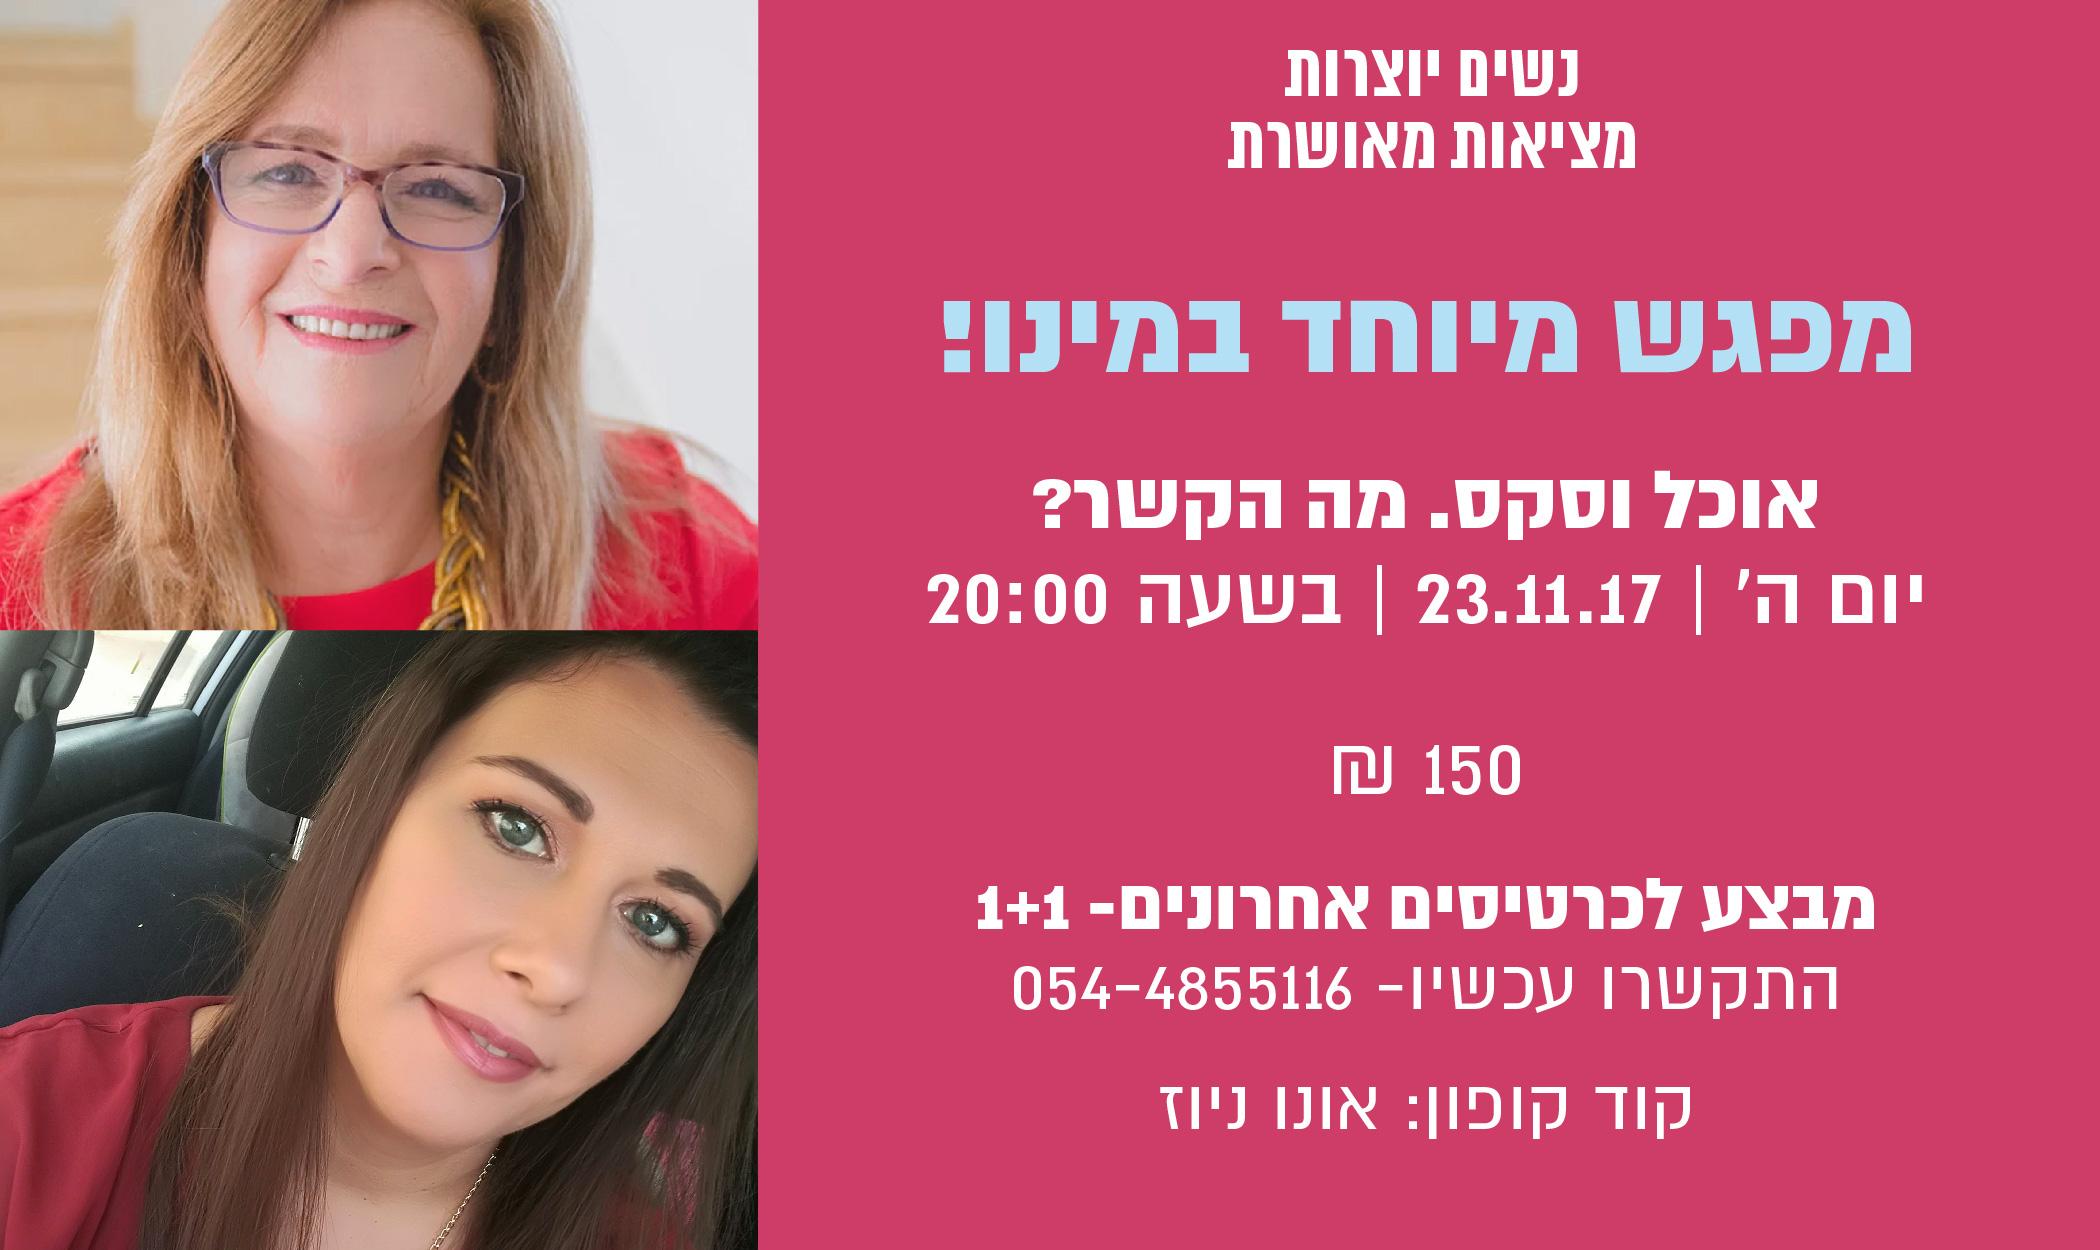 nashim_ono_FB 23-11_new